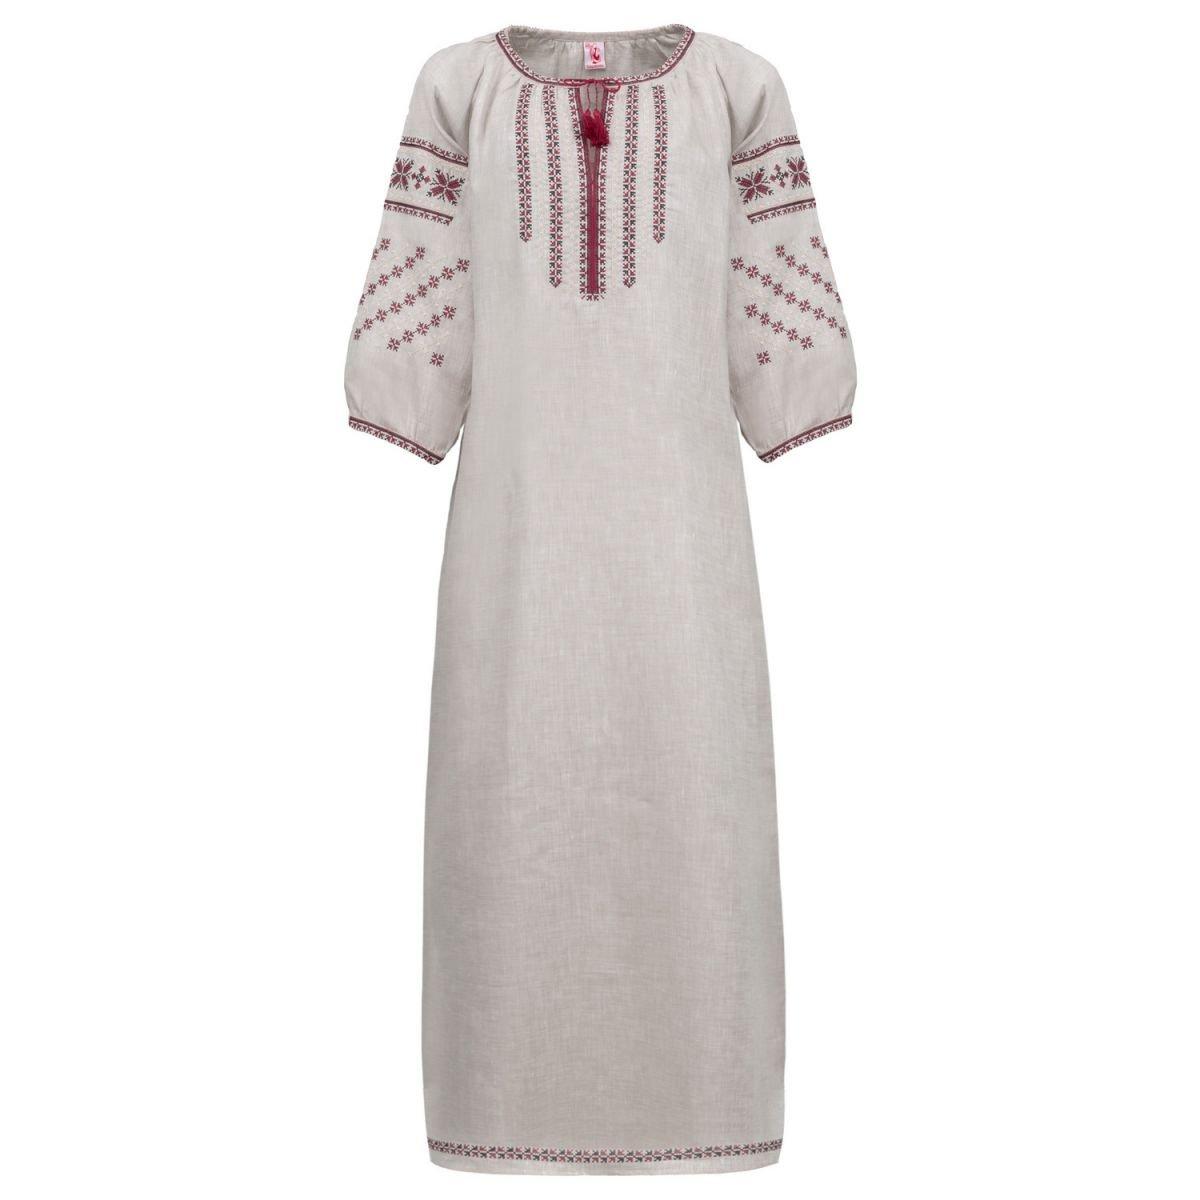 Плаття вишиванка Слобожанка - Богуслава чарівна 42 e928d566222fb